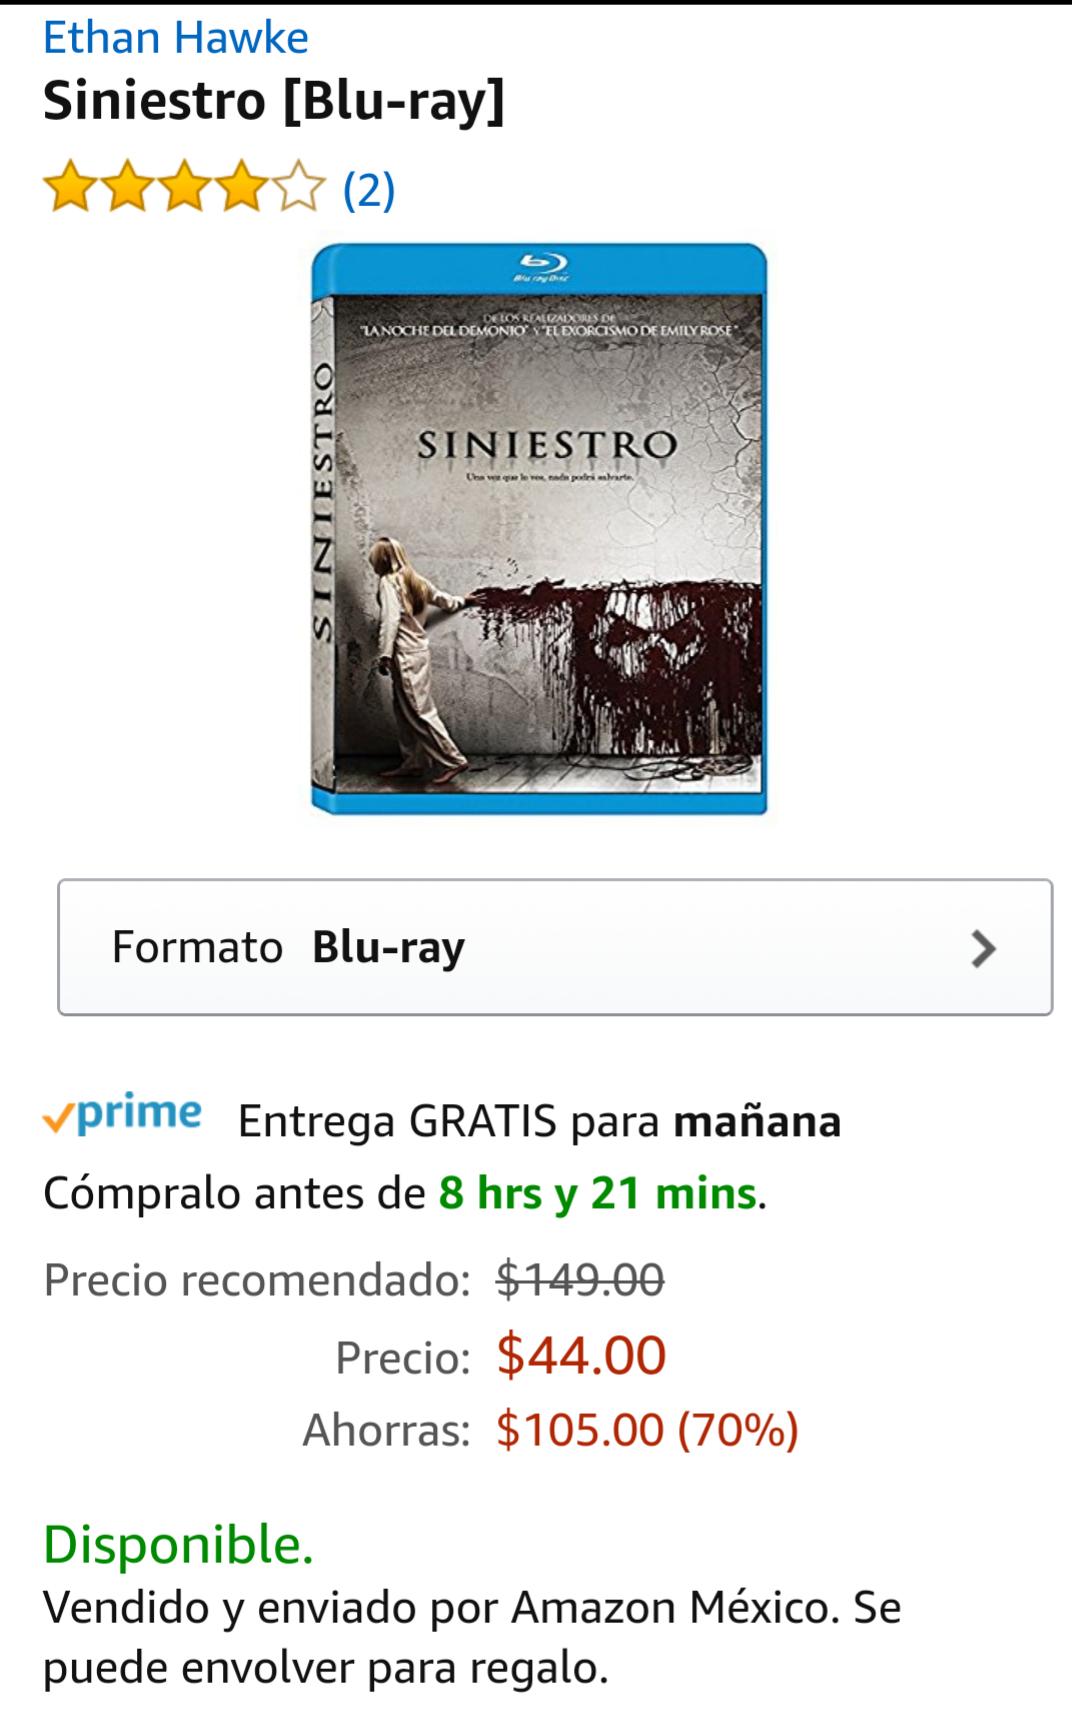 Amazon México: Blu-ray Siniestro, Prime